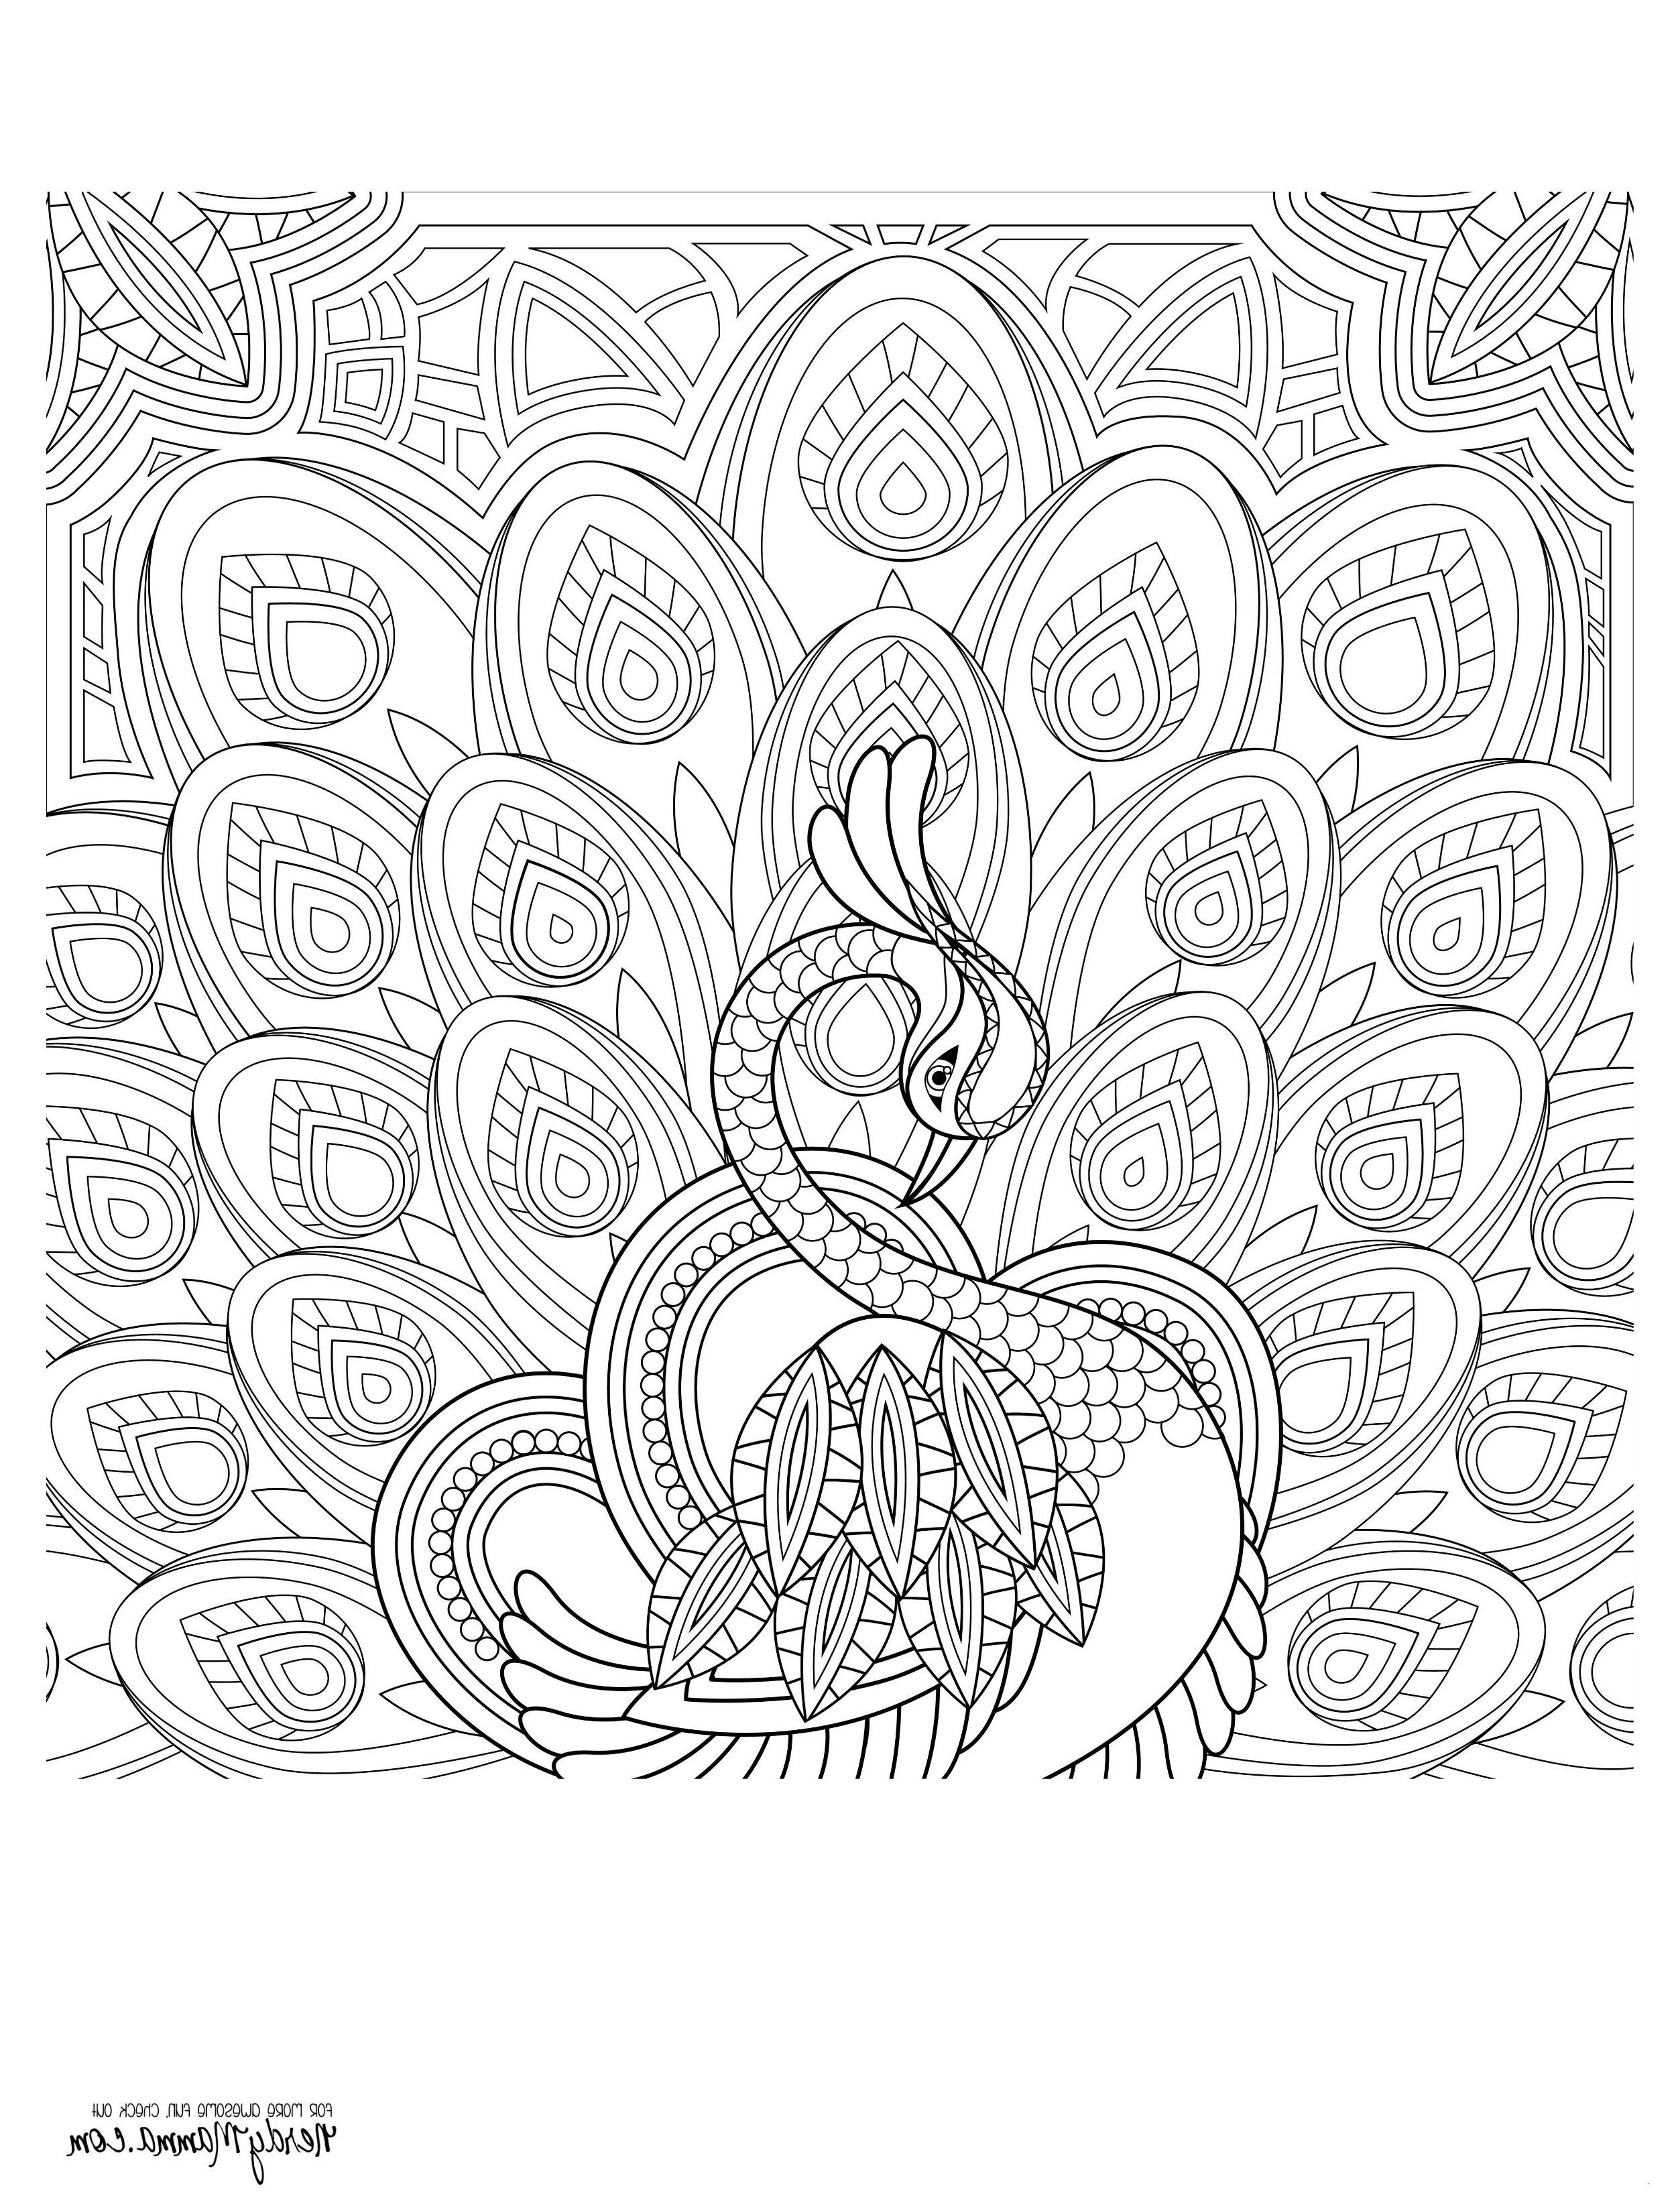 Ausmalbild Mandala Eule Inspirierend 41 Inspirierend Ausmalbilder Erwachsene Eule – Große Coloring Page Bilder